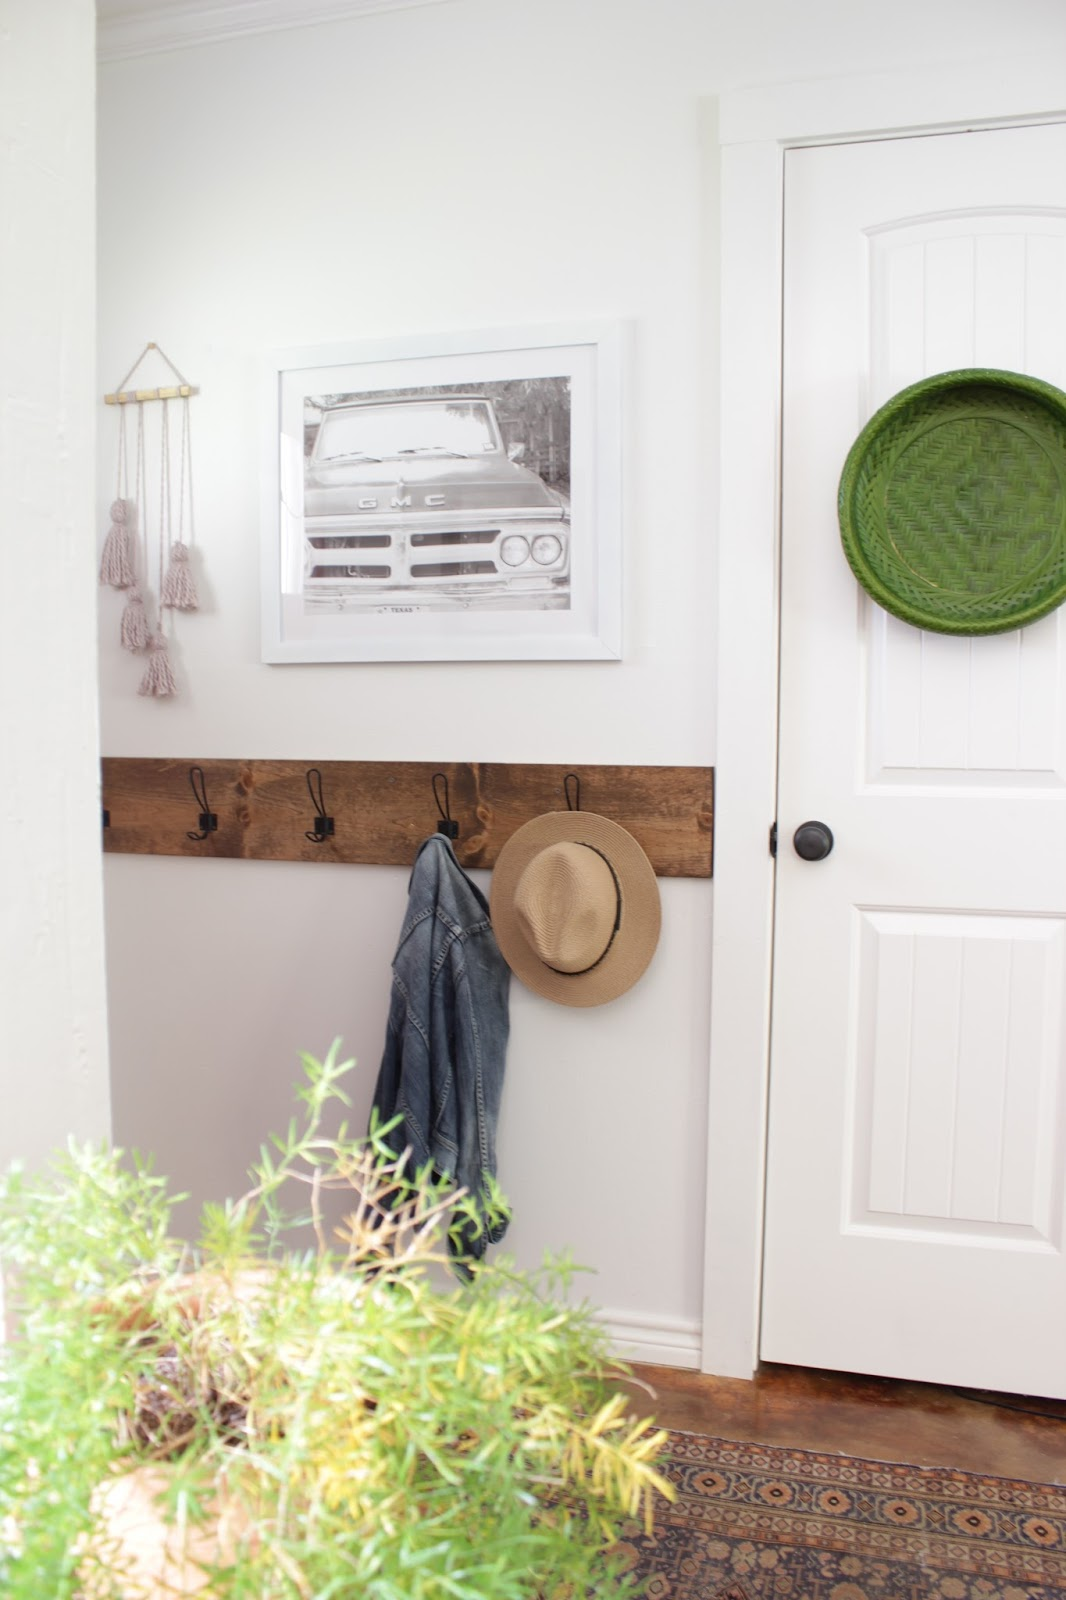 Simple tassel wall hanging